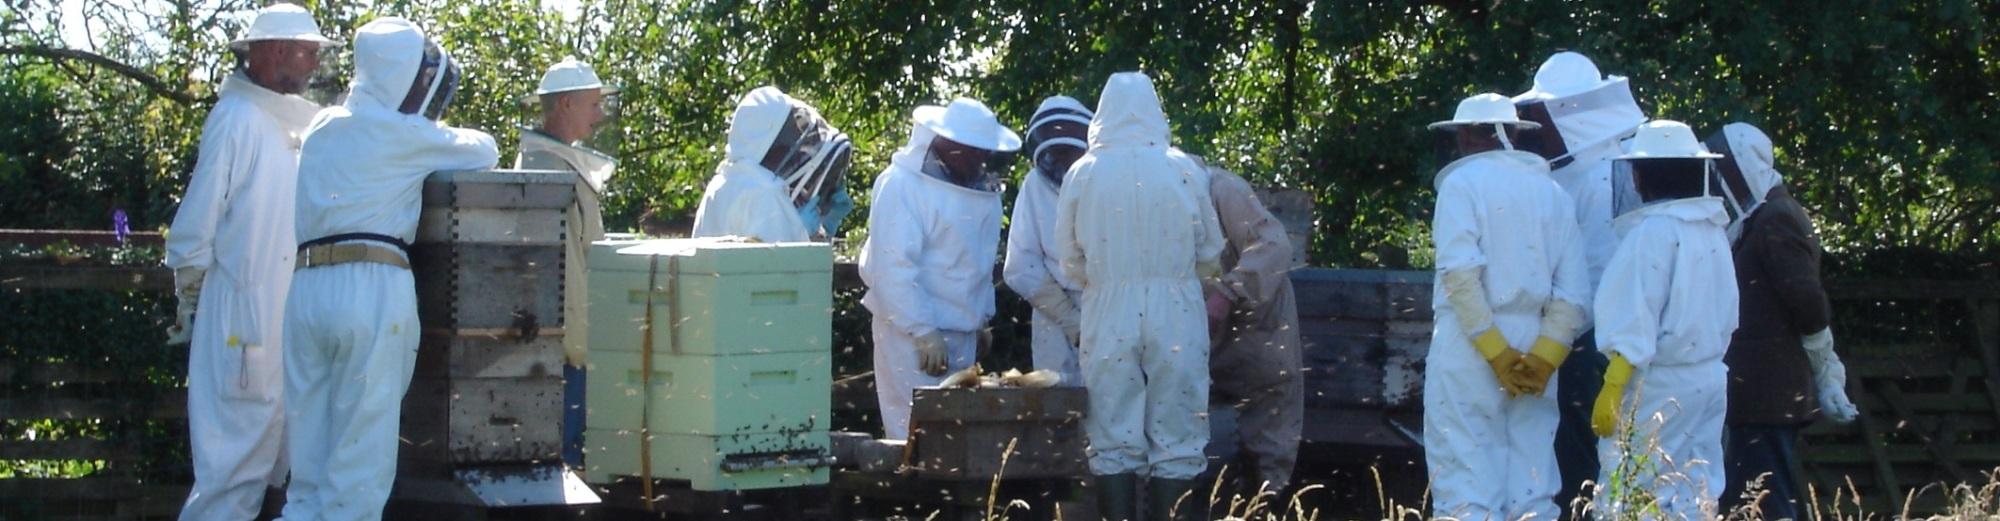 Derbyshire Beekeepers